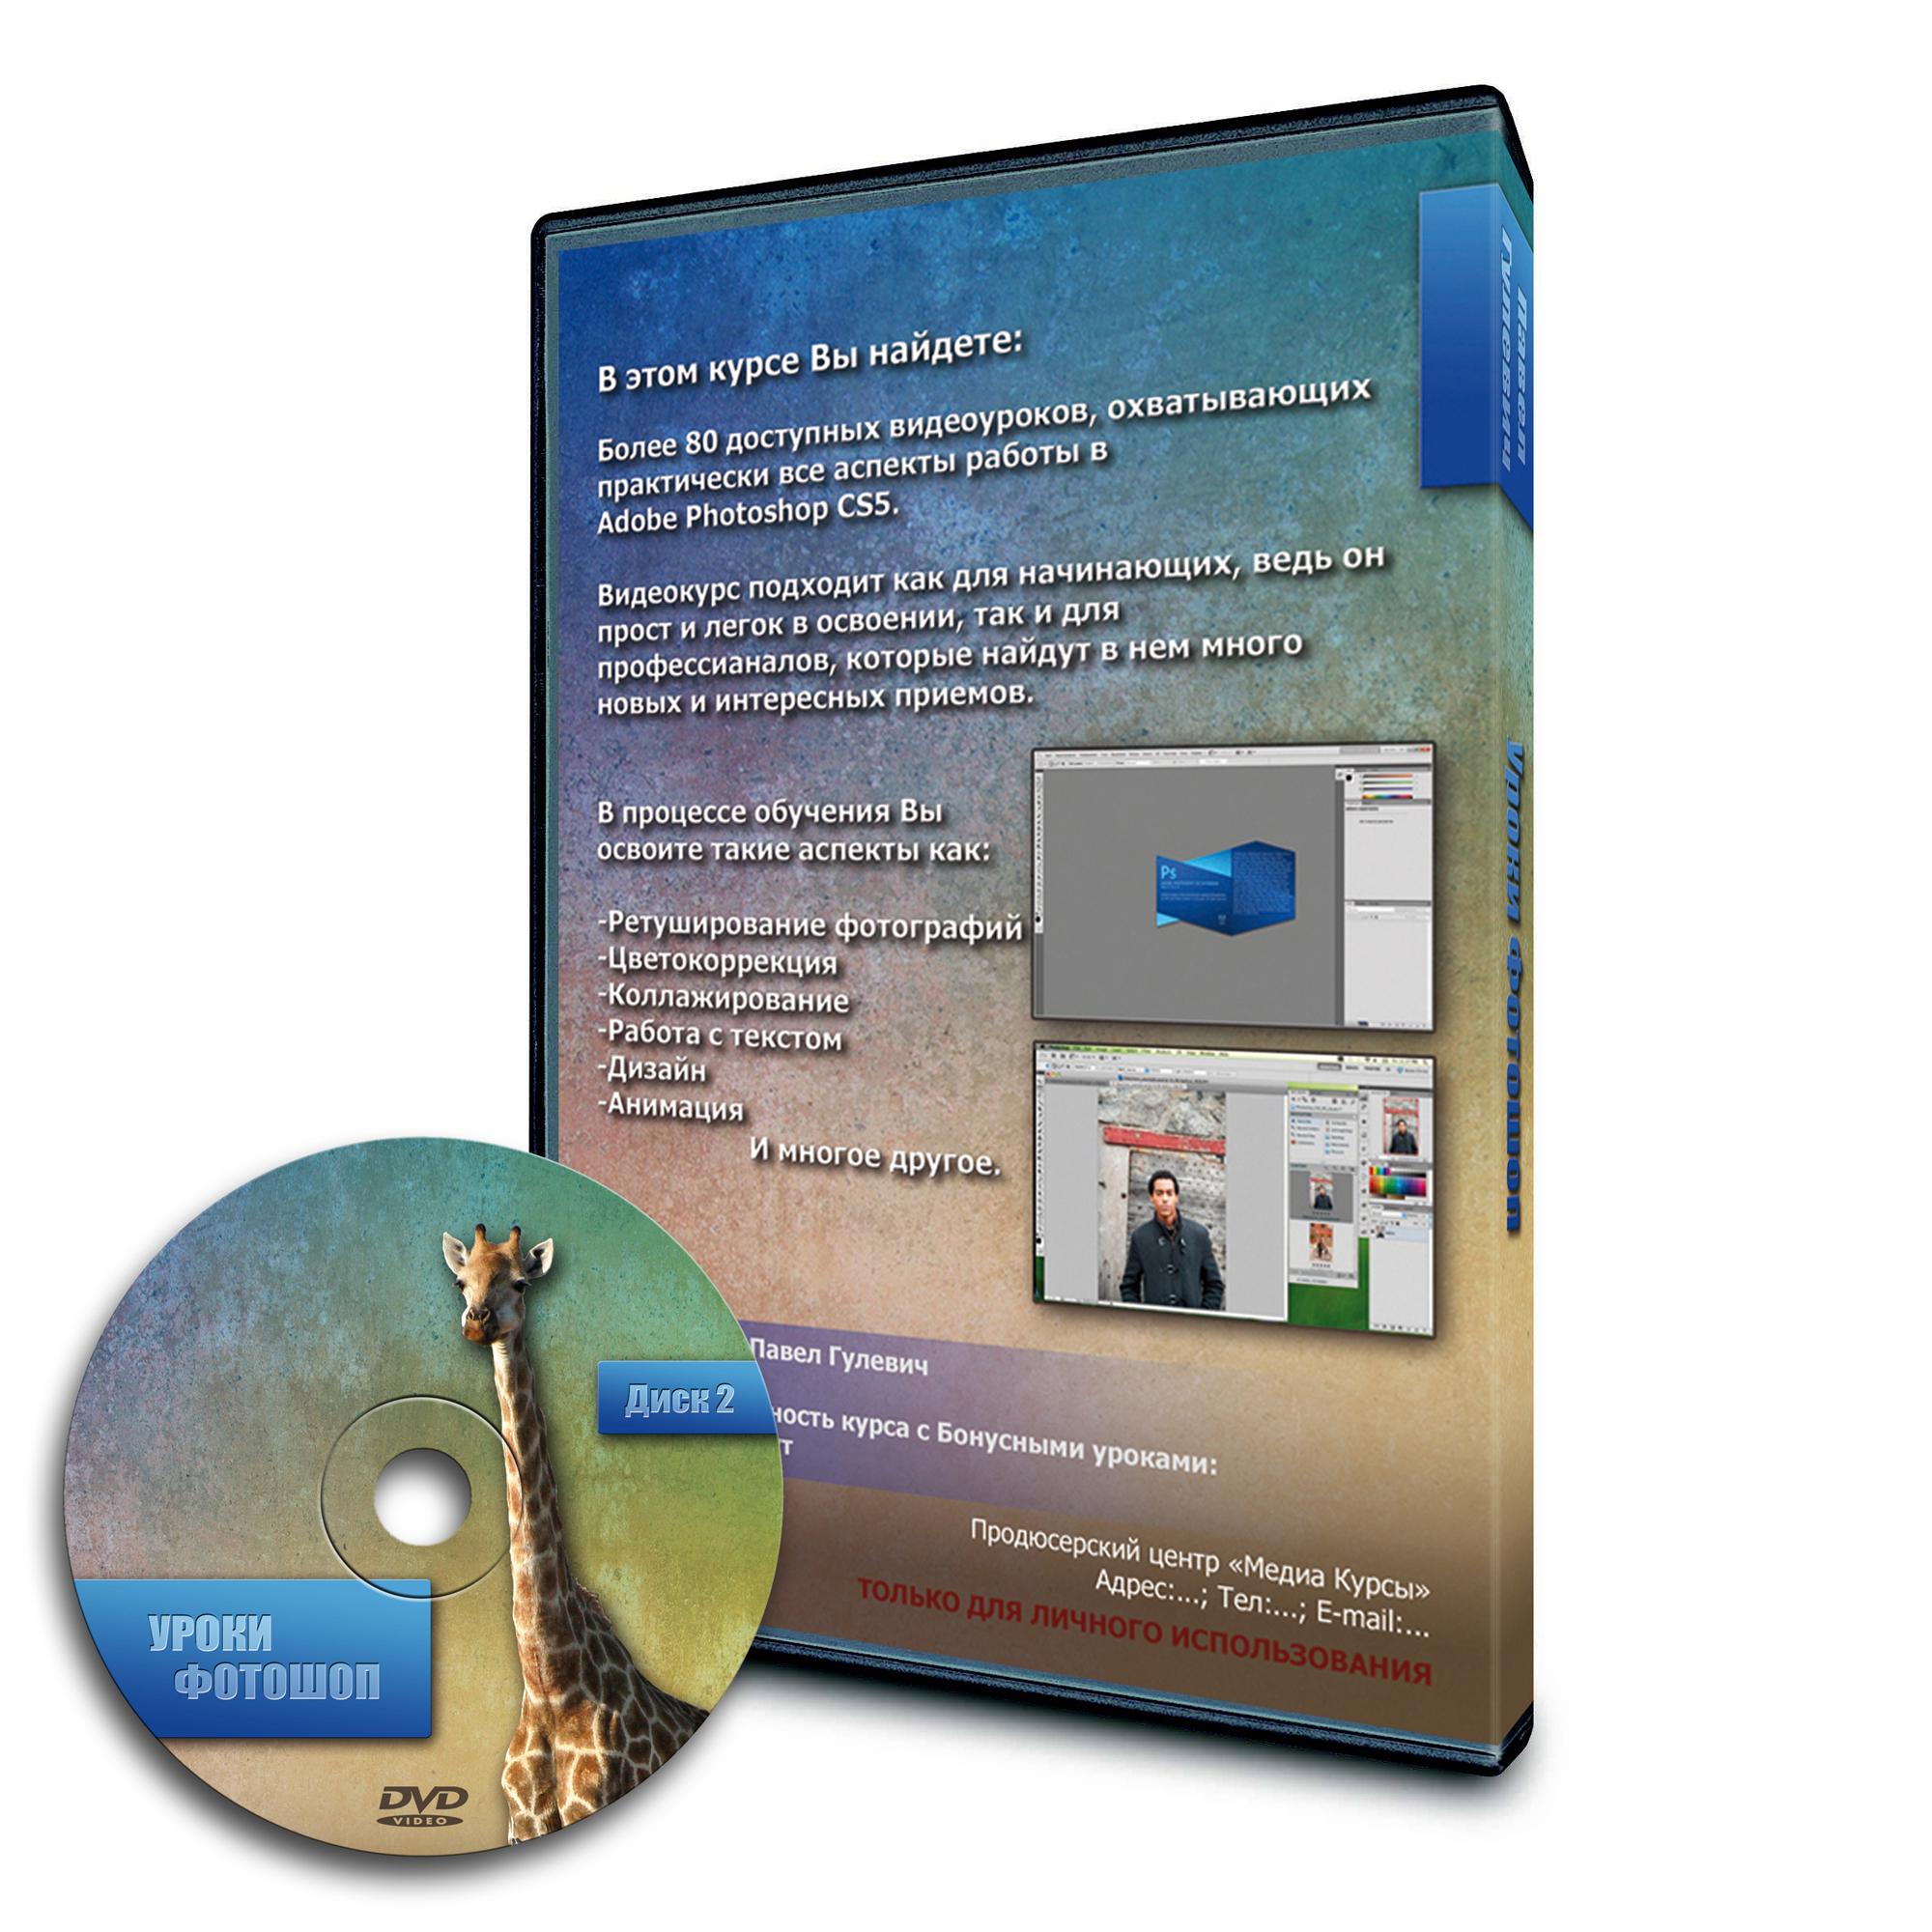 Создание дизайна DVD релиза (обложка, накатка, меню и т.п.) фото f_4d8f935b38e5d.jpg